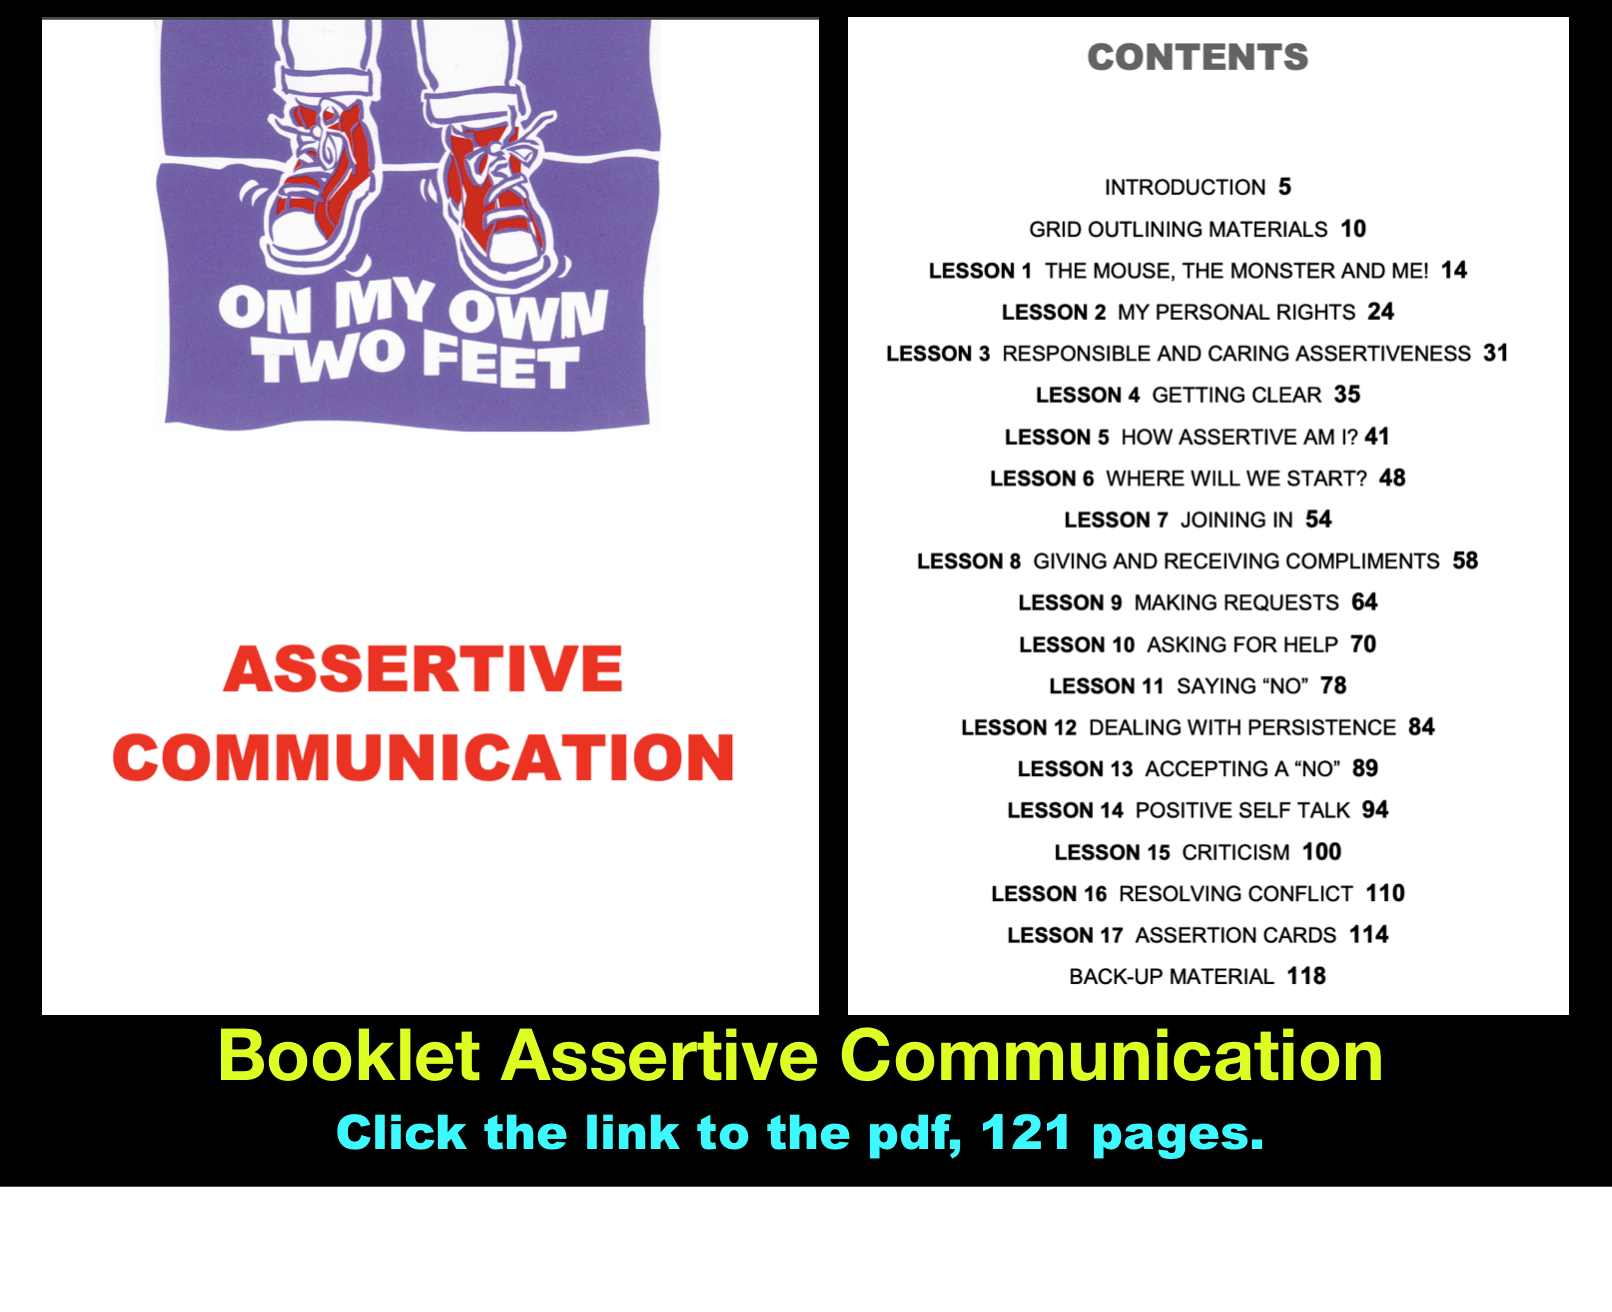 Booklet Adolescents Assertive Communication 121